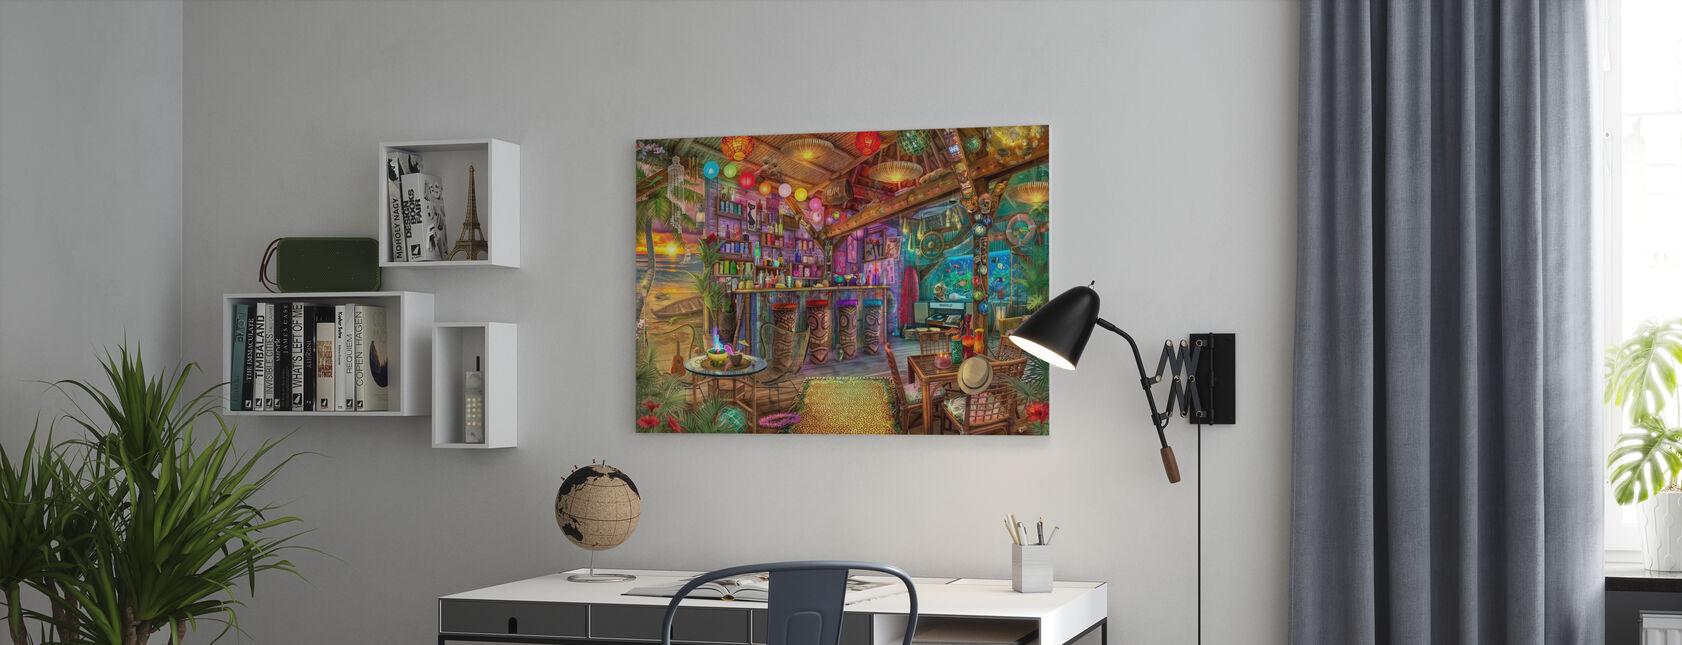 Tiki Beach Sunset - Canvas print - Office